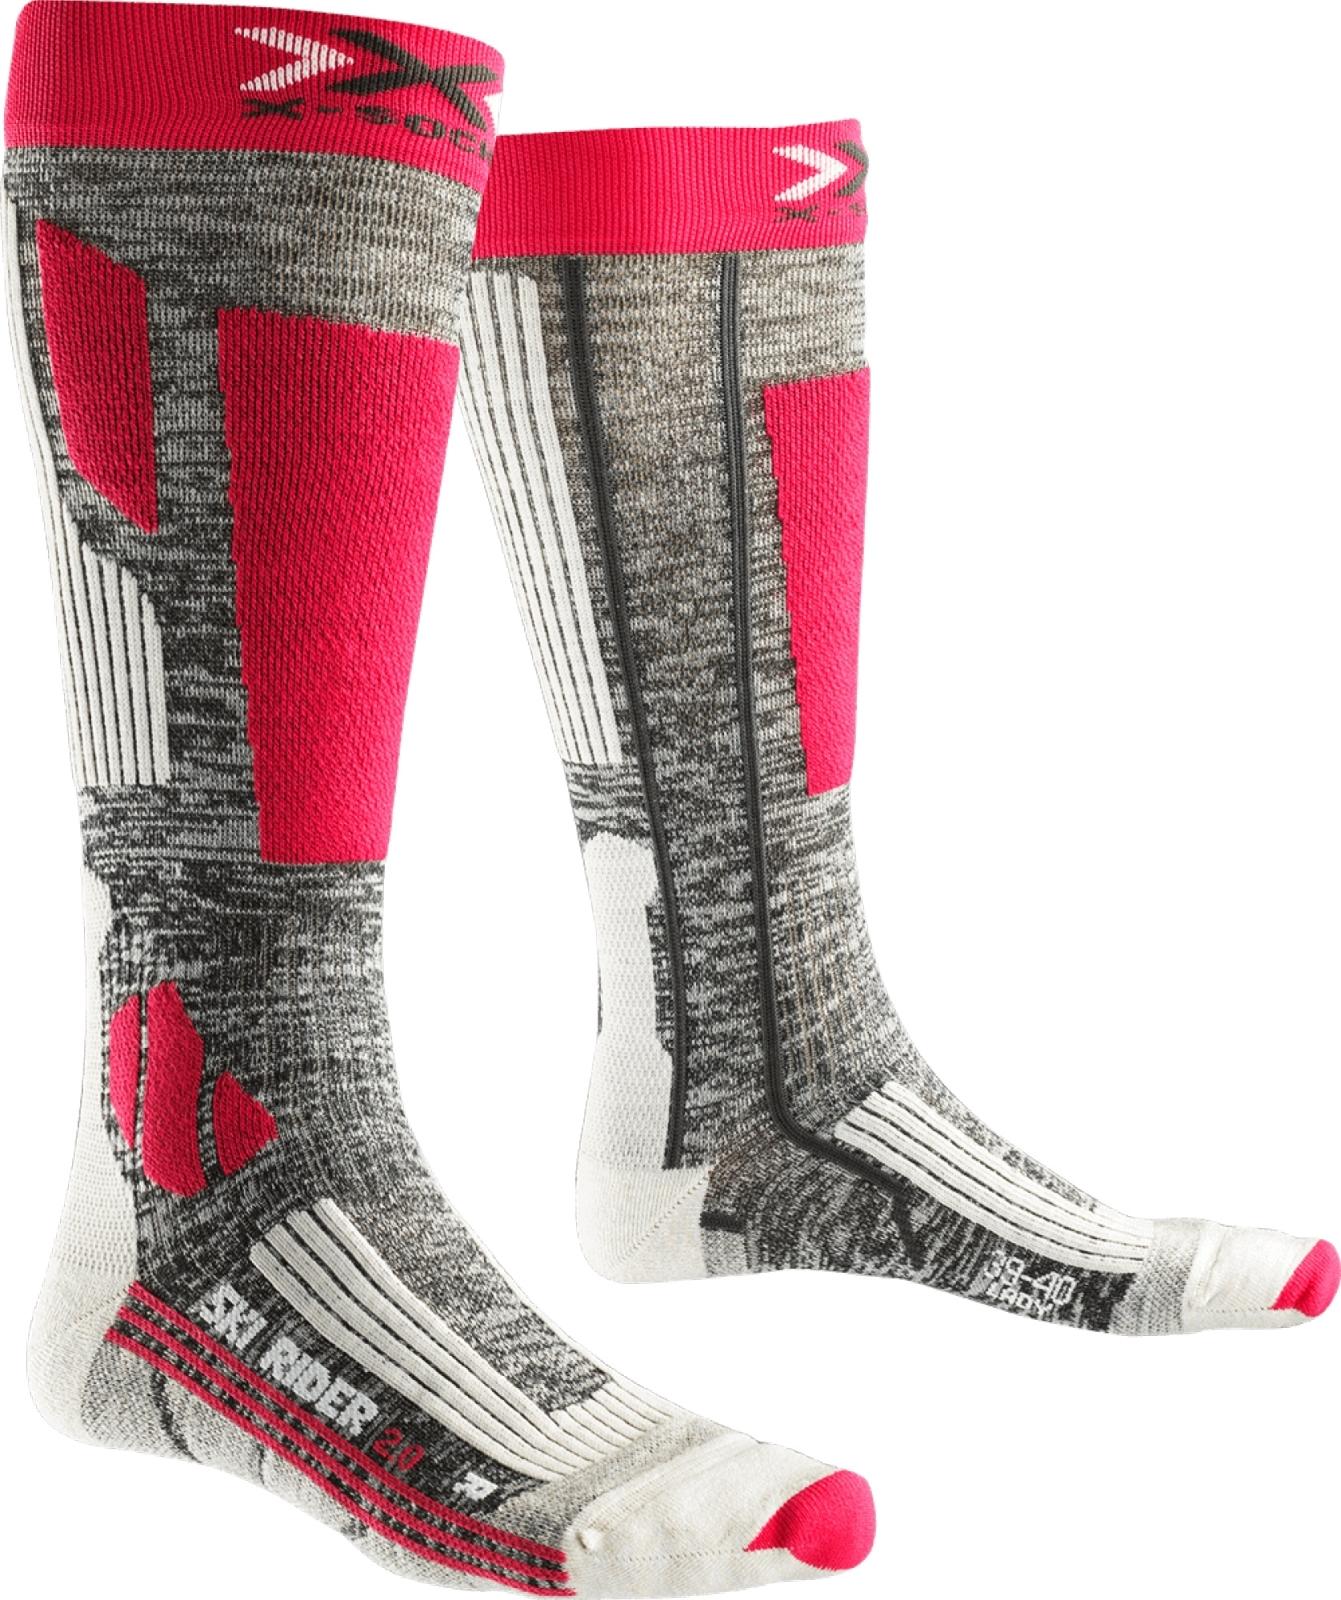 X-Socks Ski Rider 2.0 Socks Women - Grey Melange/Fuchsia 35-36